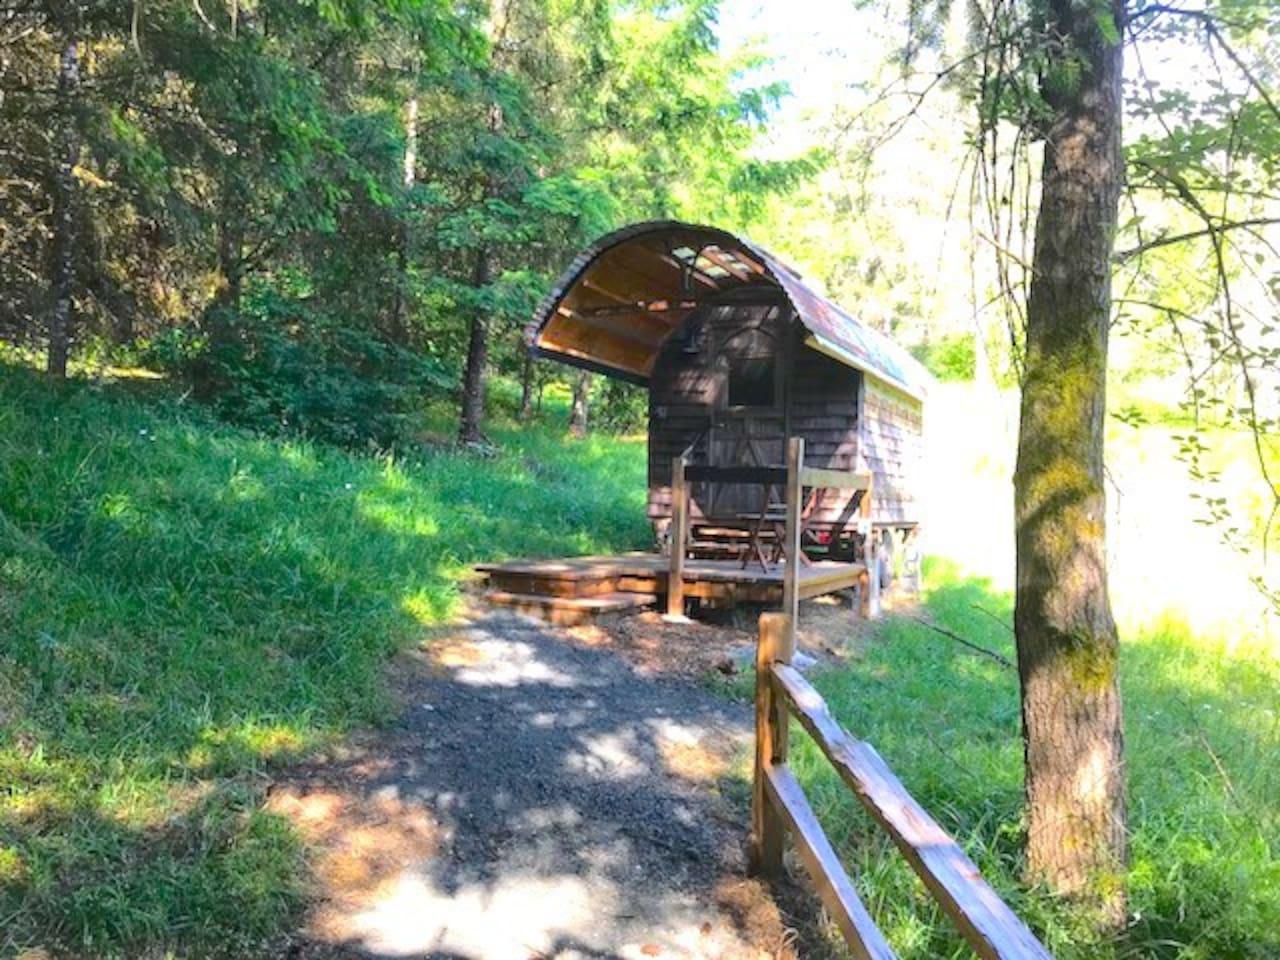 Sheepherder's Wagon 1